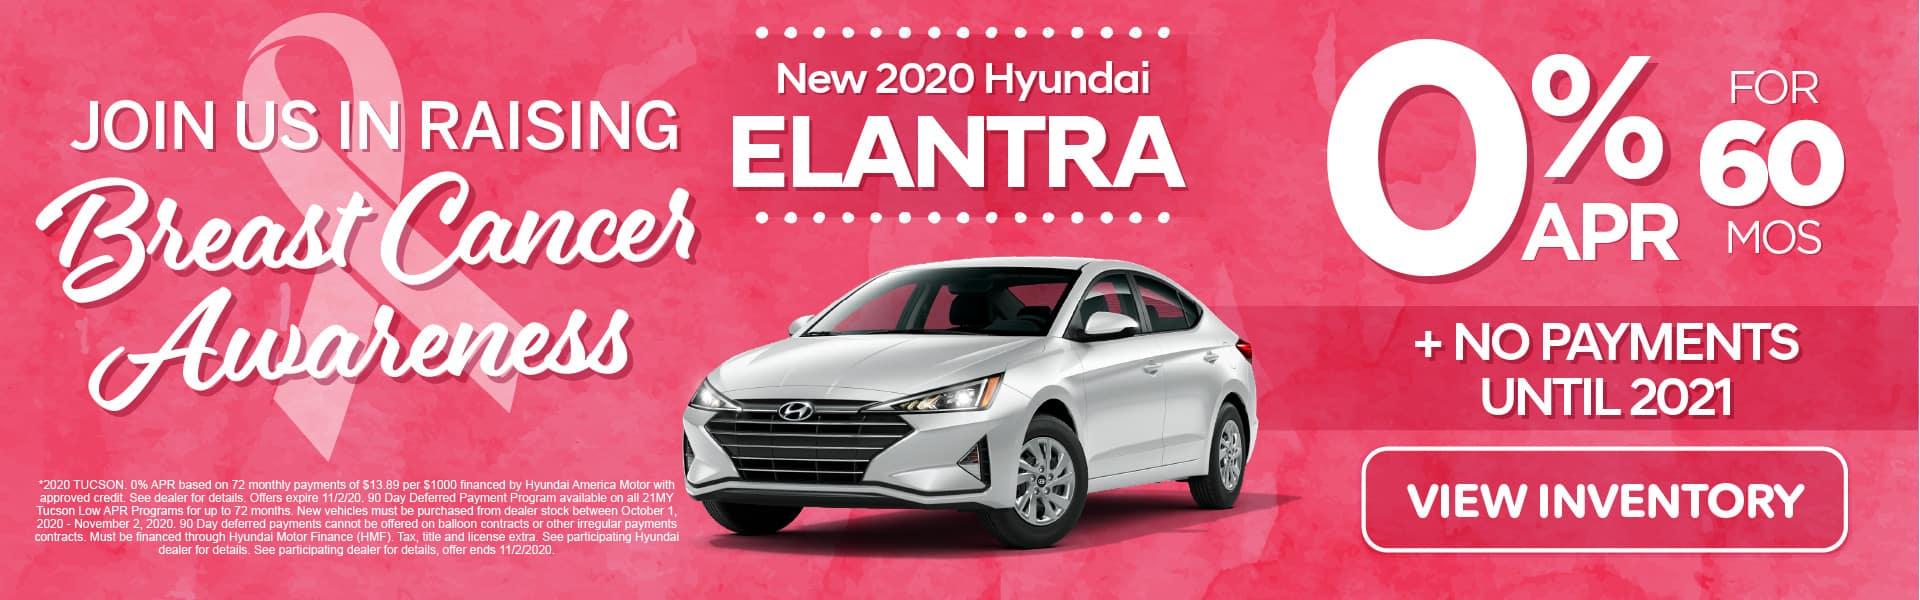 2020 Elantra 0% APR for 60 months